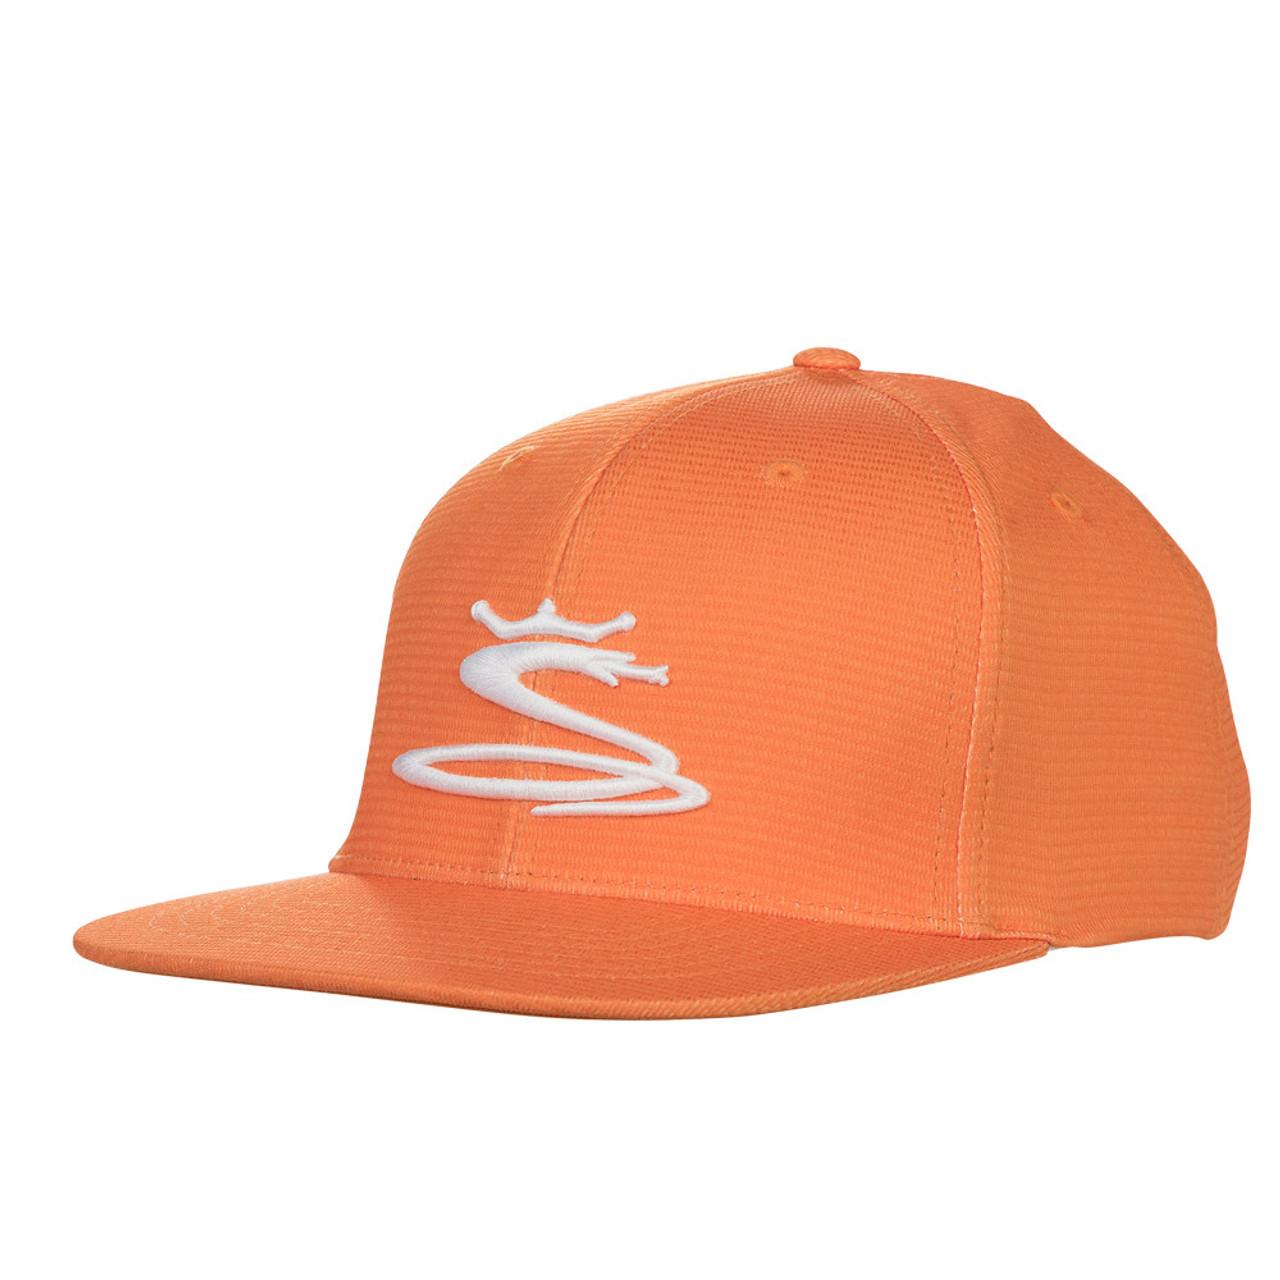 Cobra Tour Snake Snapback Caps - Vibrant Orange